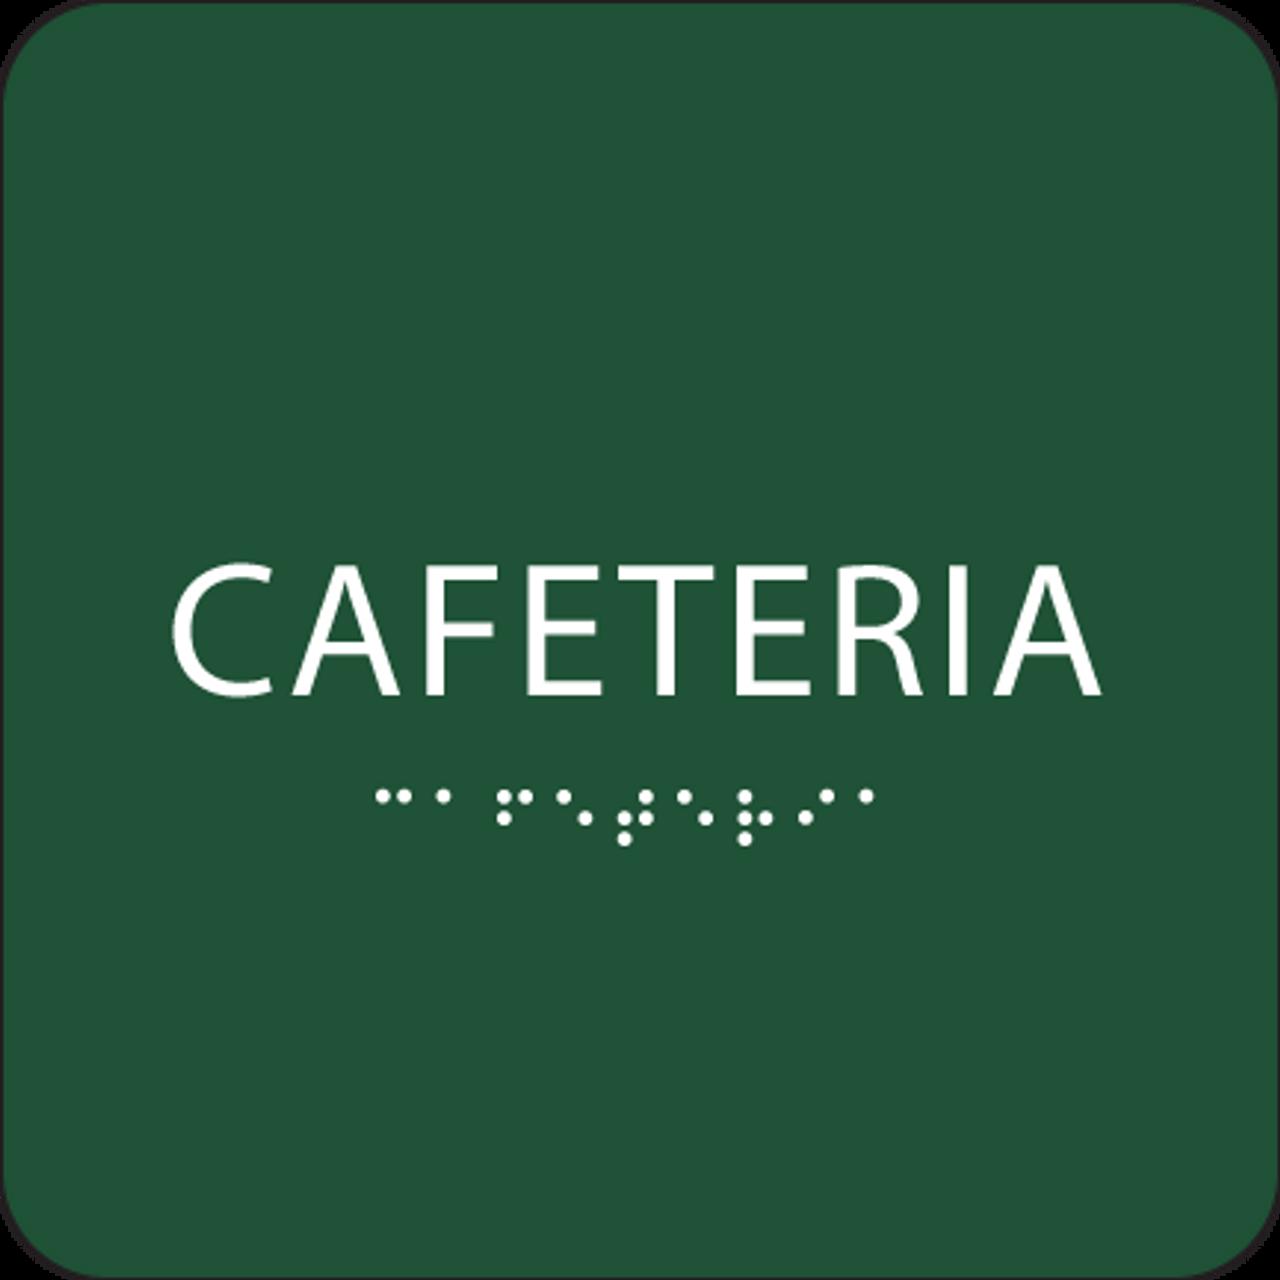 Green Cafeteria ADA Sign